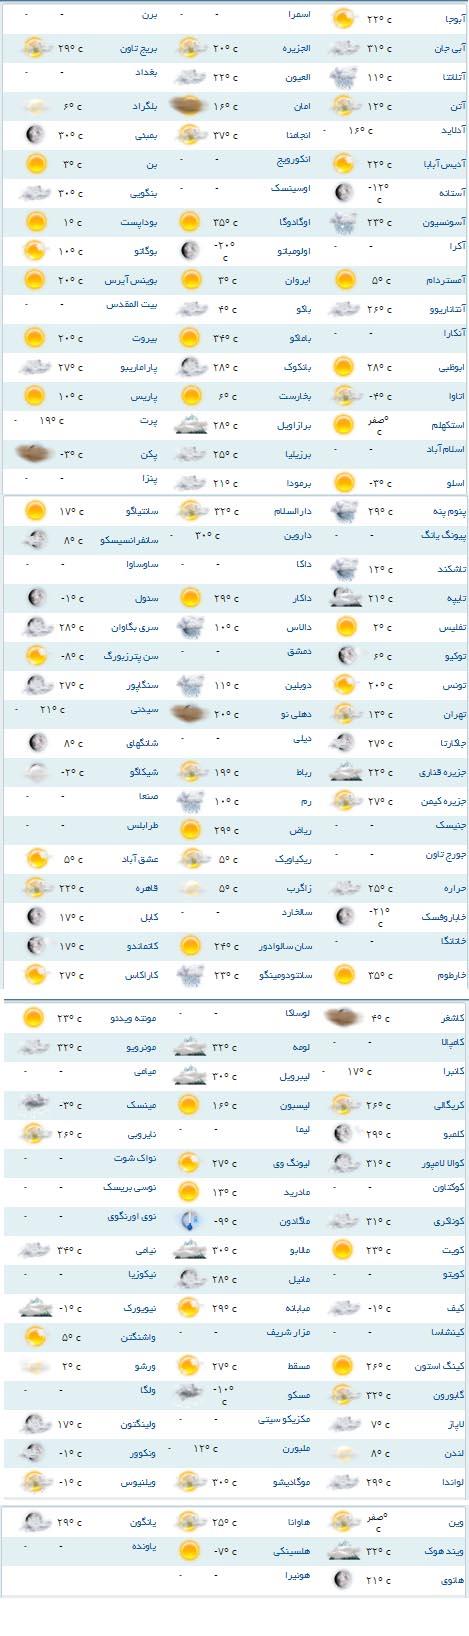 وضعیت آب و هوای مناطق مختلف جهان+جدول